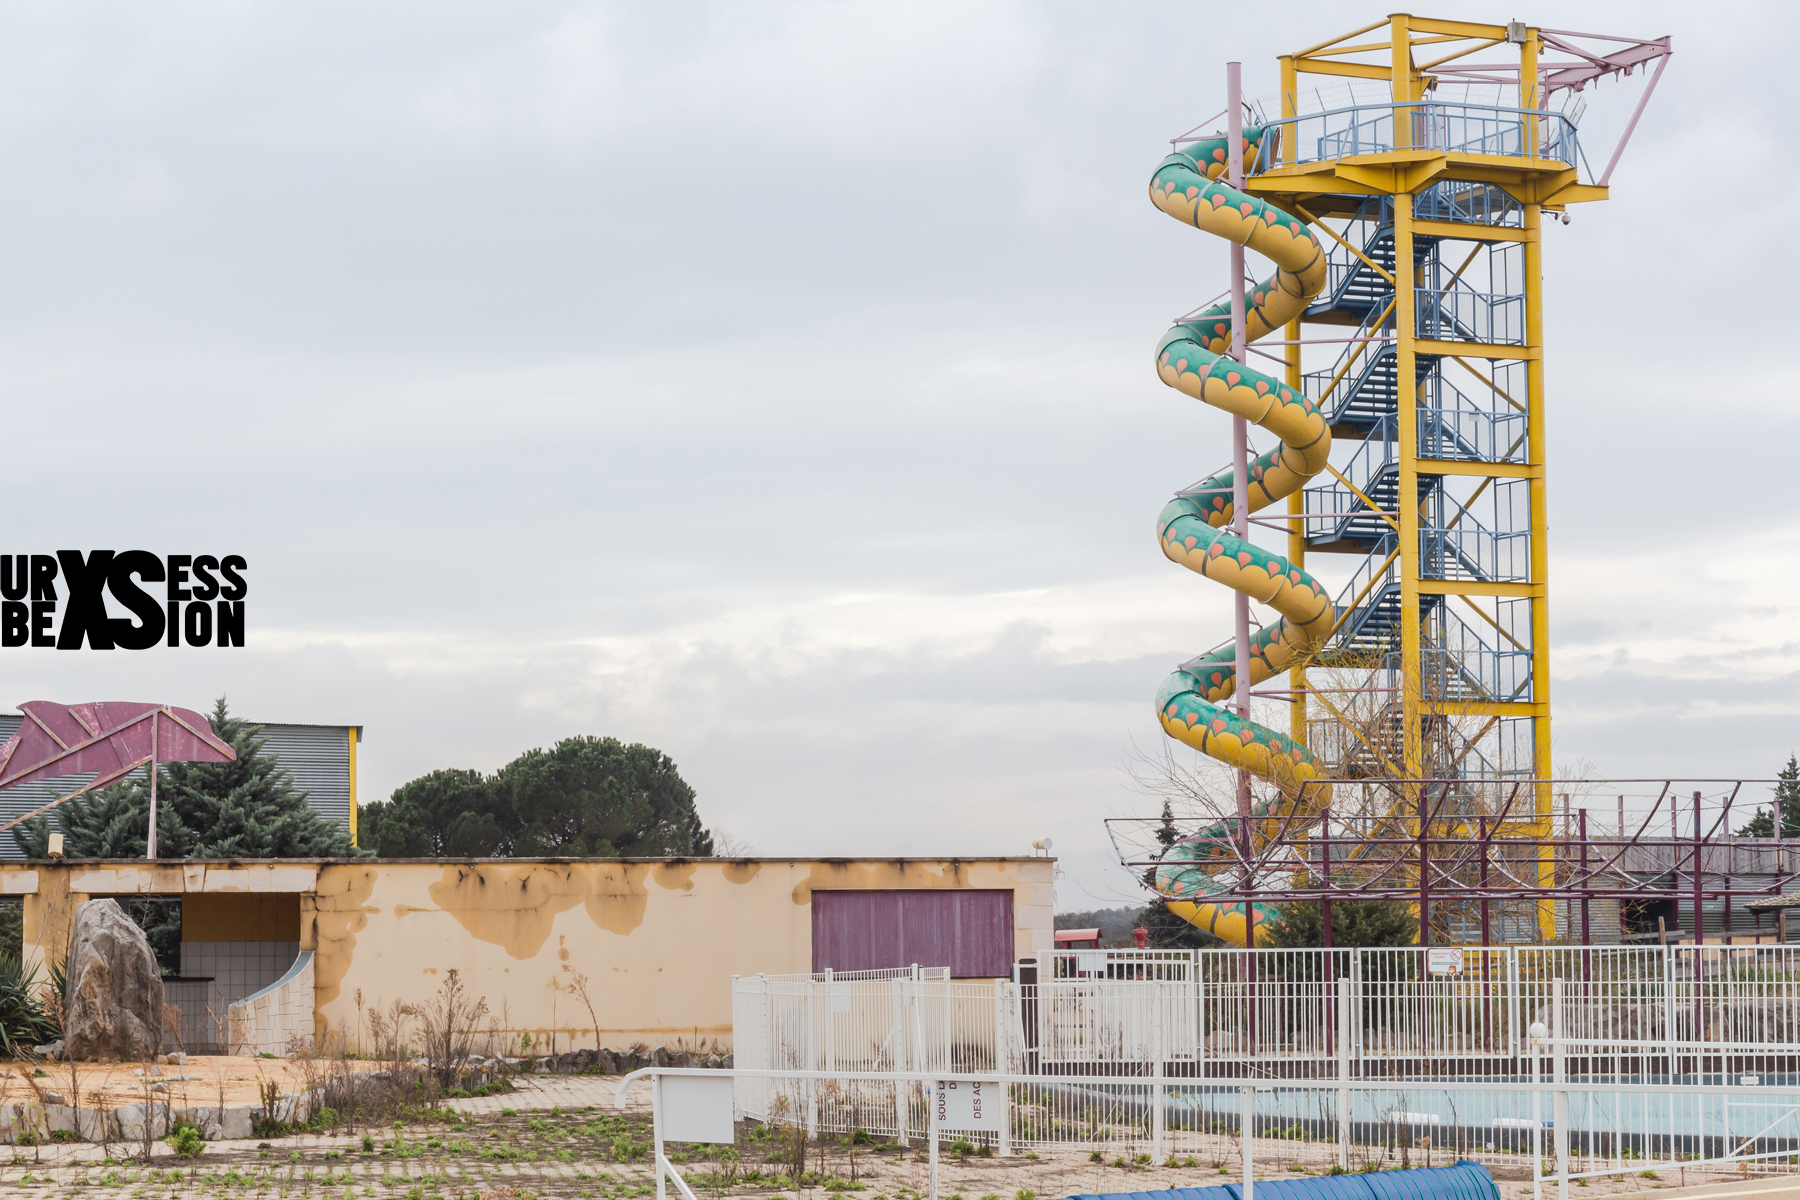 Abandoned amusement park in France | urbexsession.com/en/gacy-land-amusement-park | Urbex France